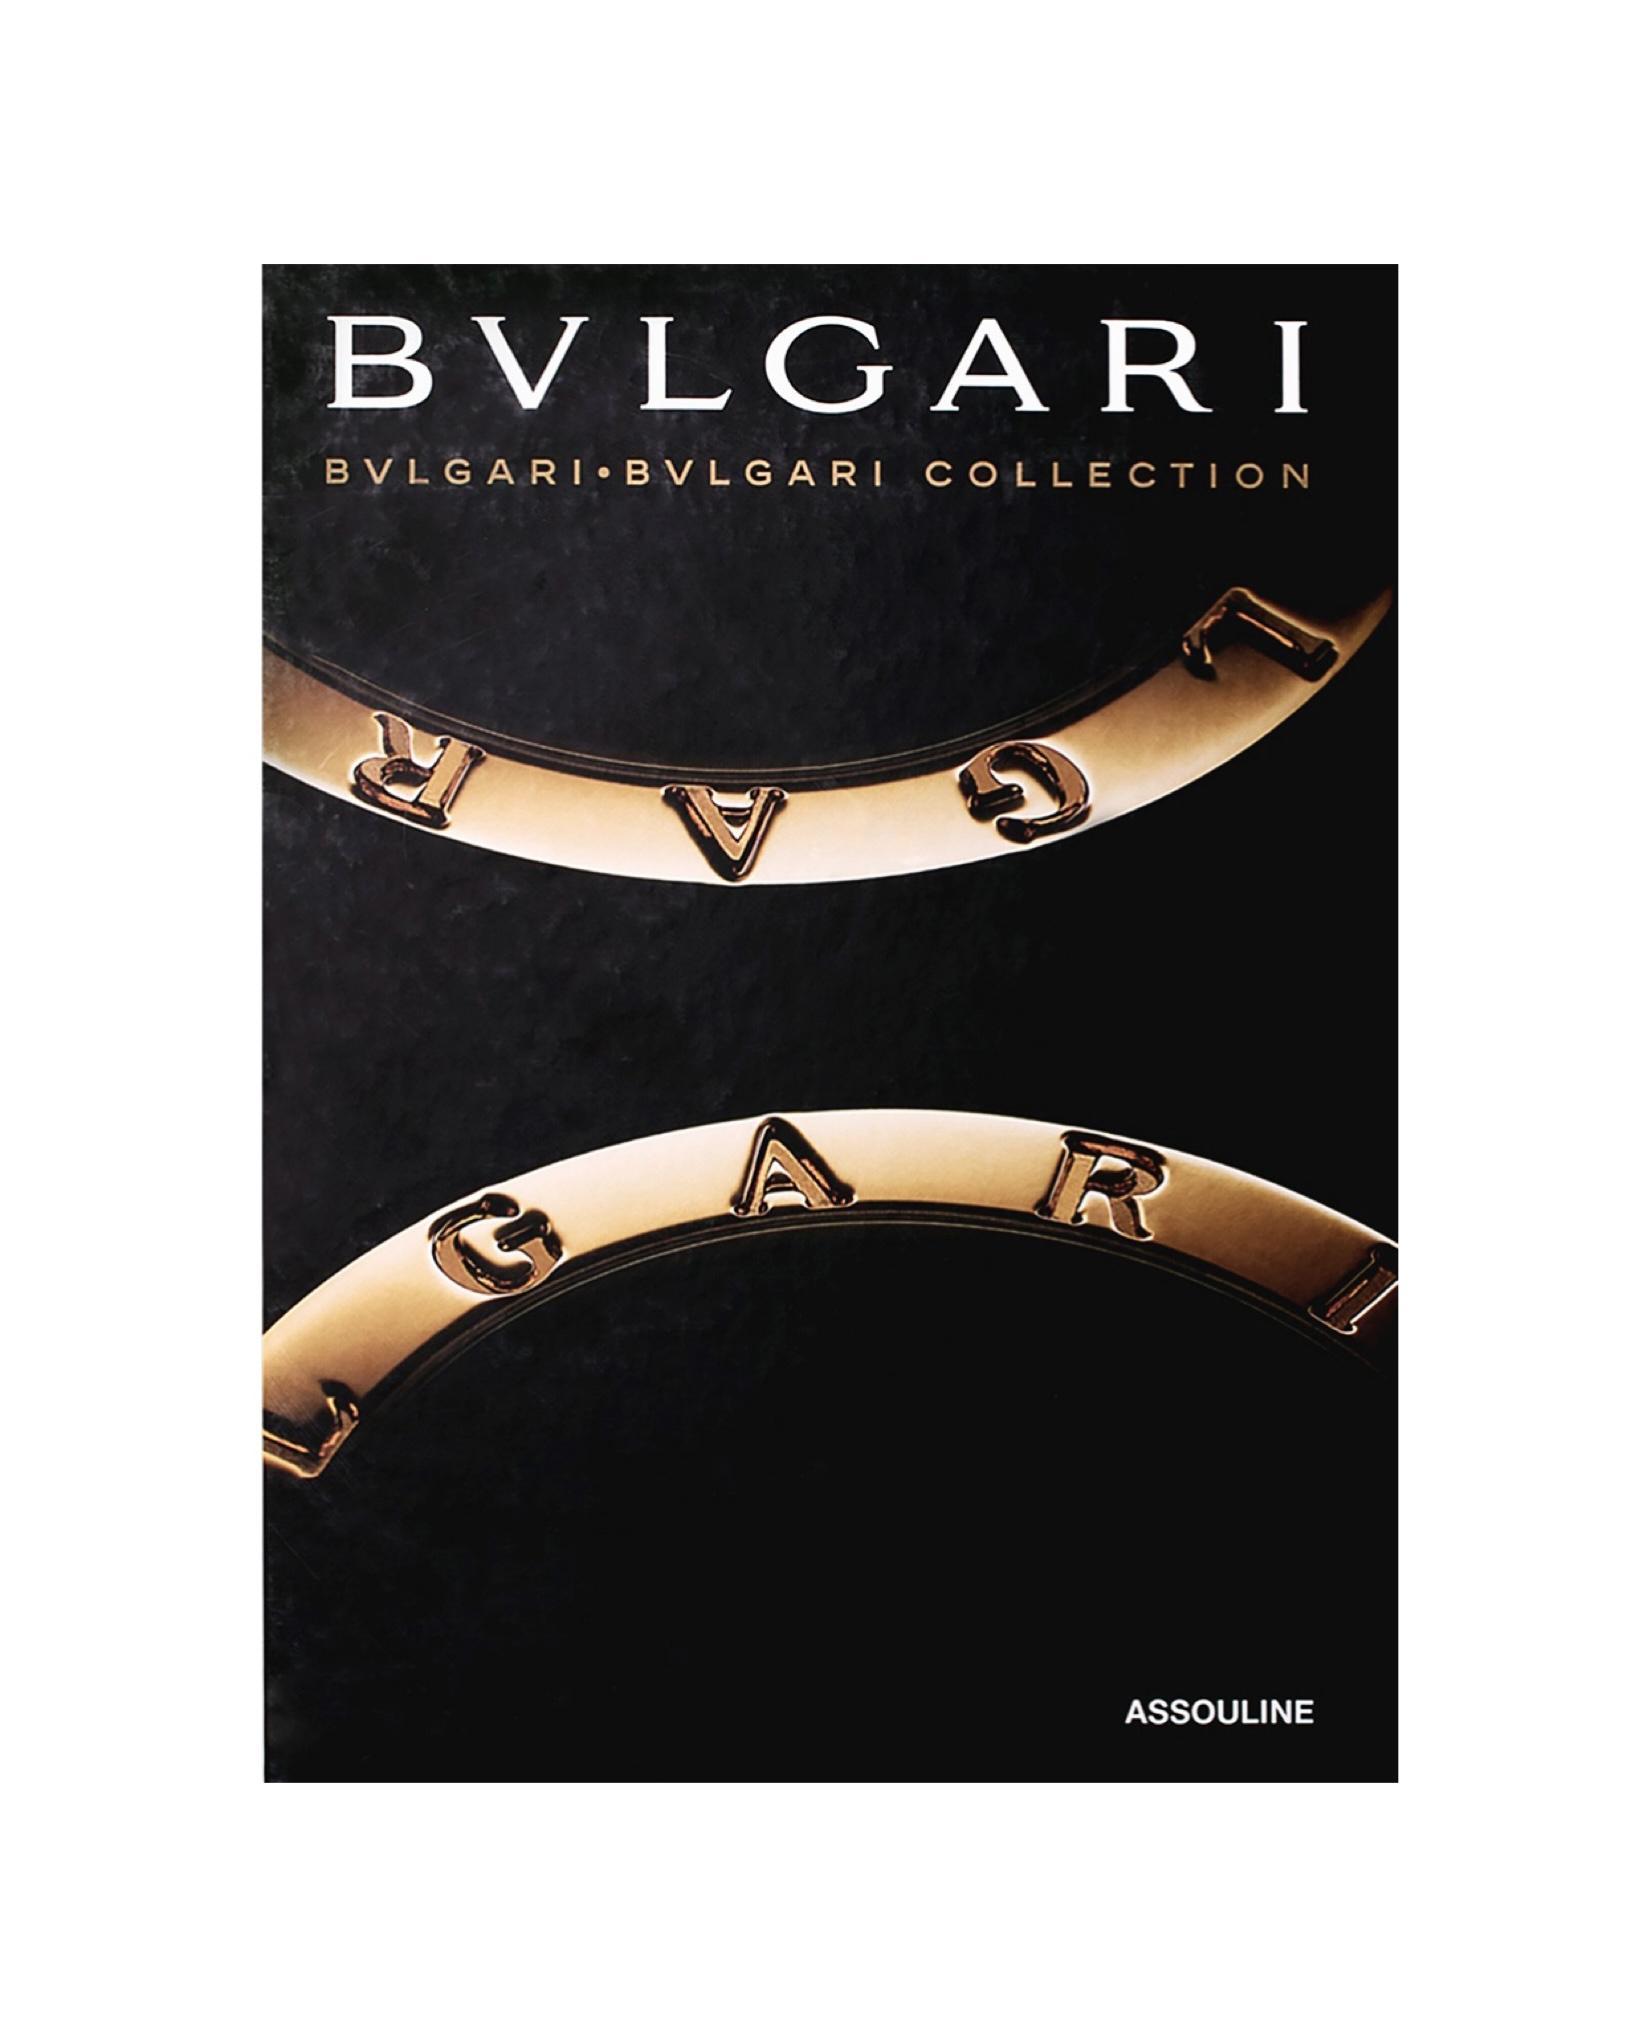 VLGARI Collection Bok IMAGE BY ME